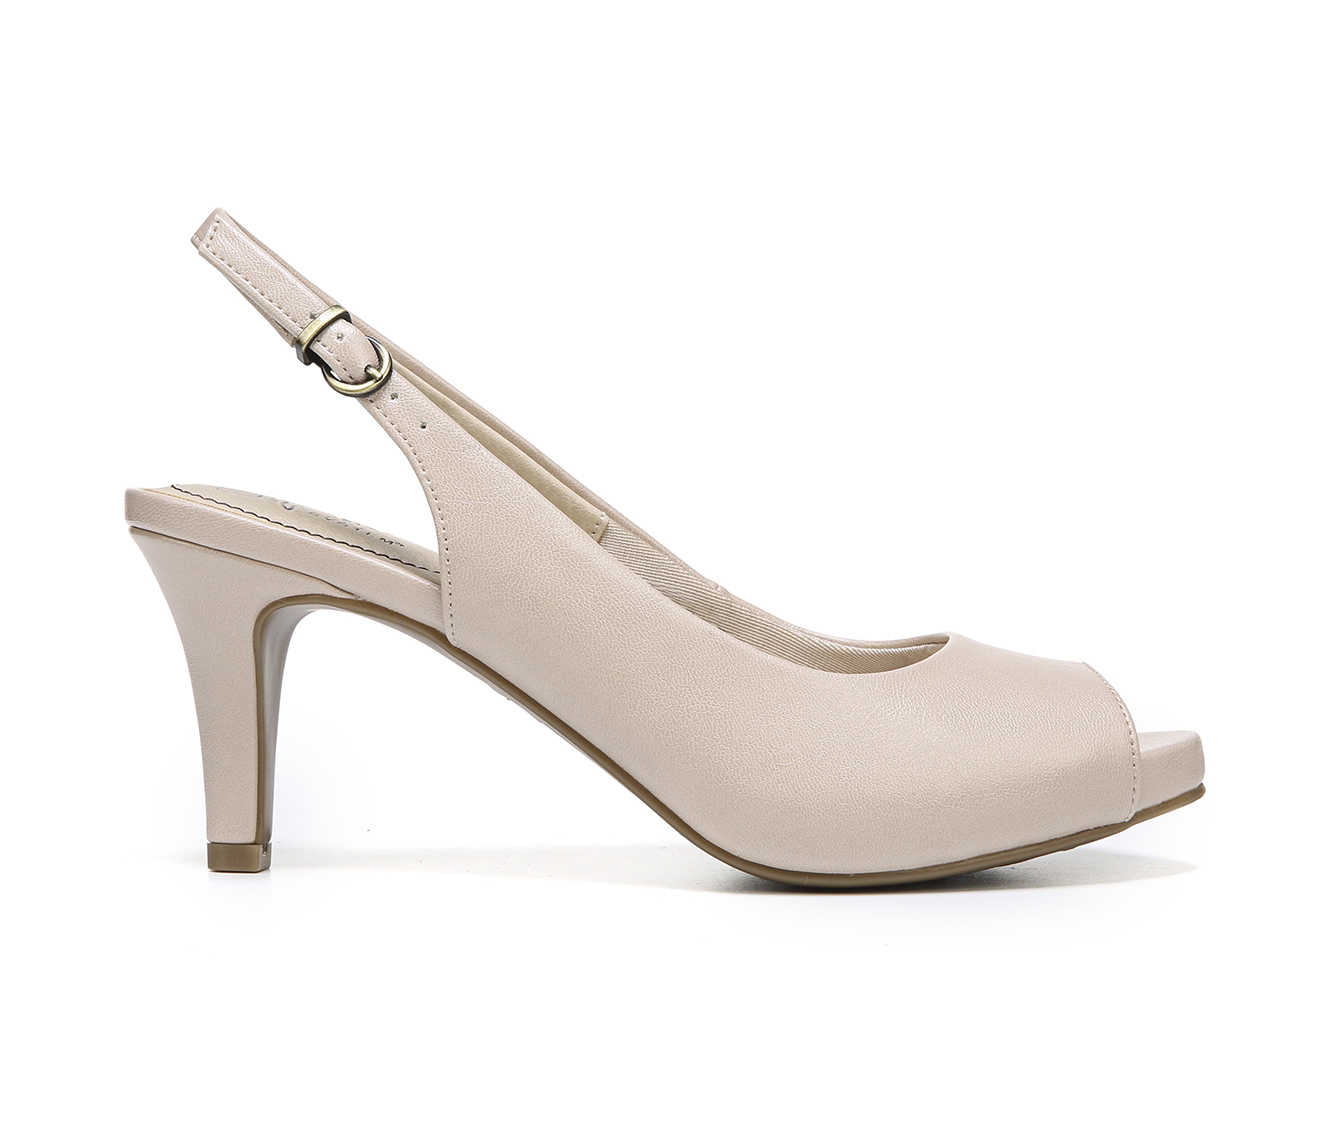 LifeStride Teller Women's Dress Shoe (Pink Faux Leather)